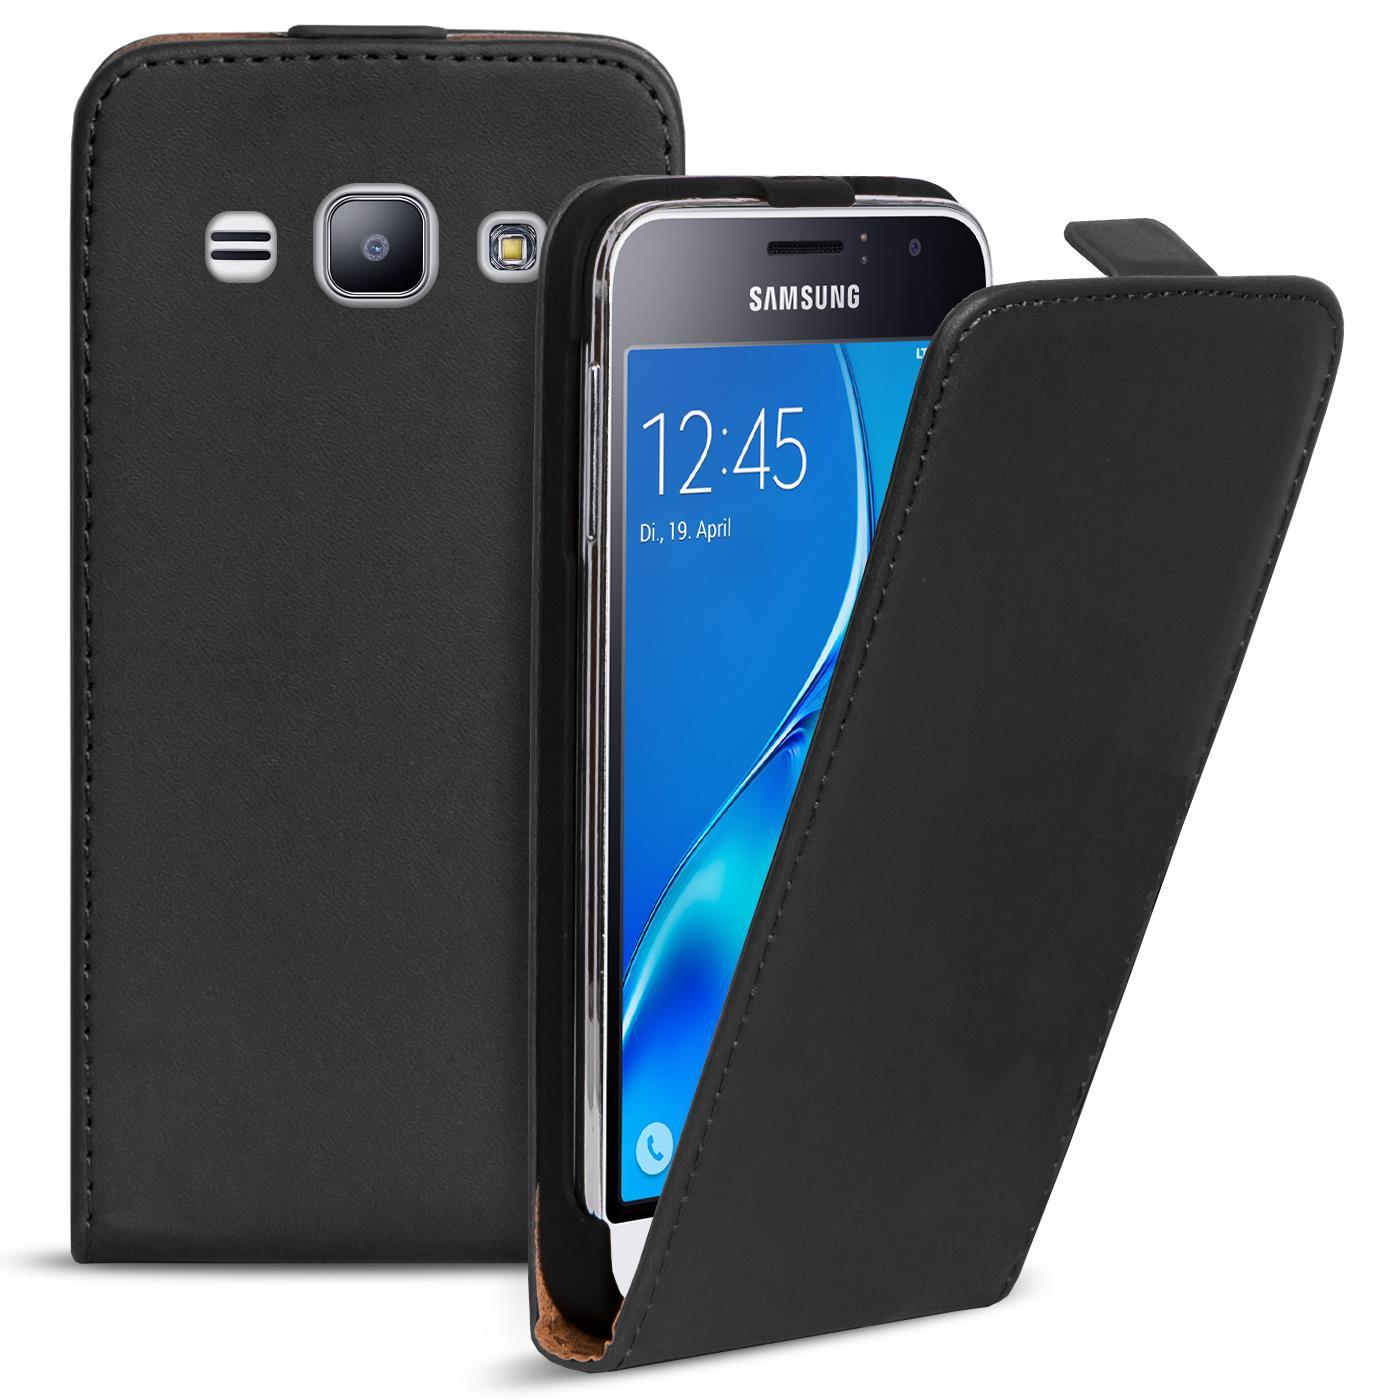 Flip Case Samsung Galaxy J3 2016 Case Pu Leather Flip Case Pouch